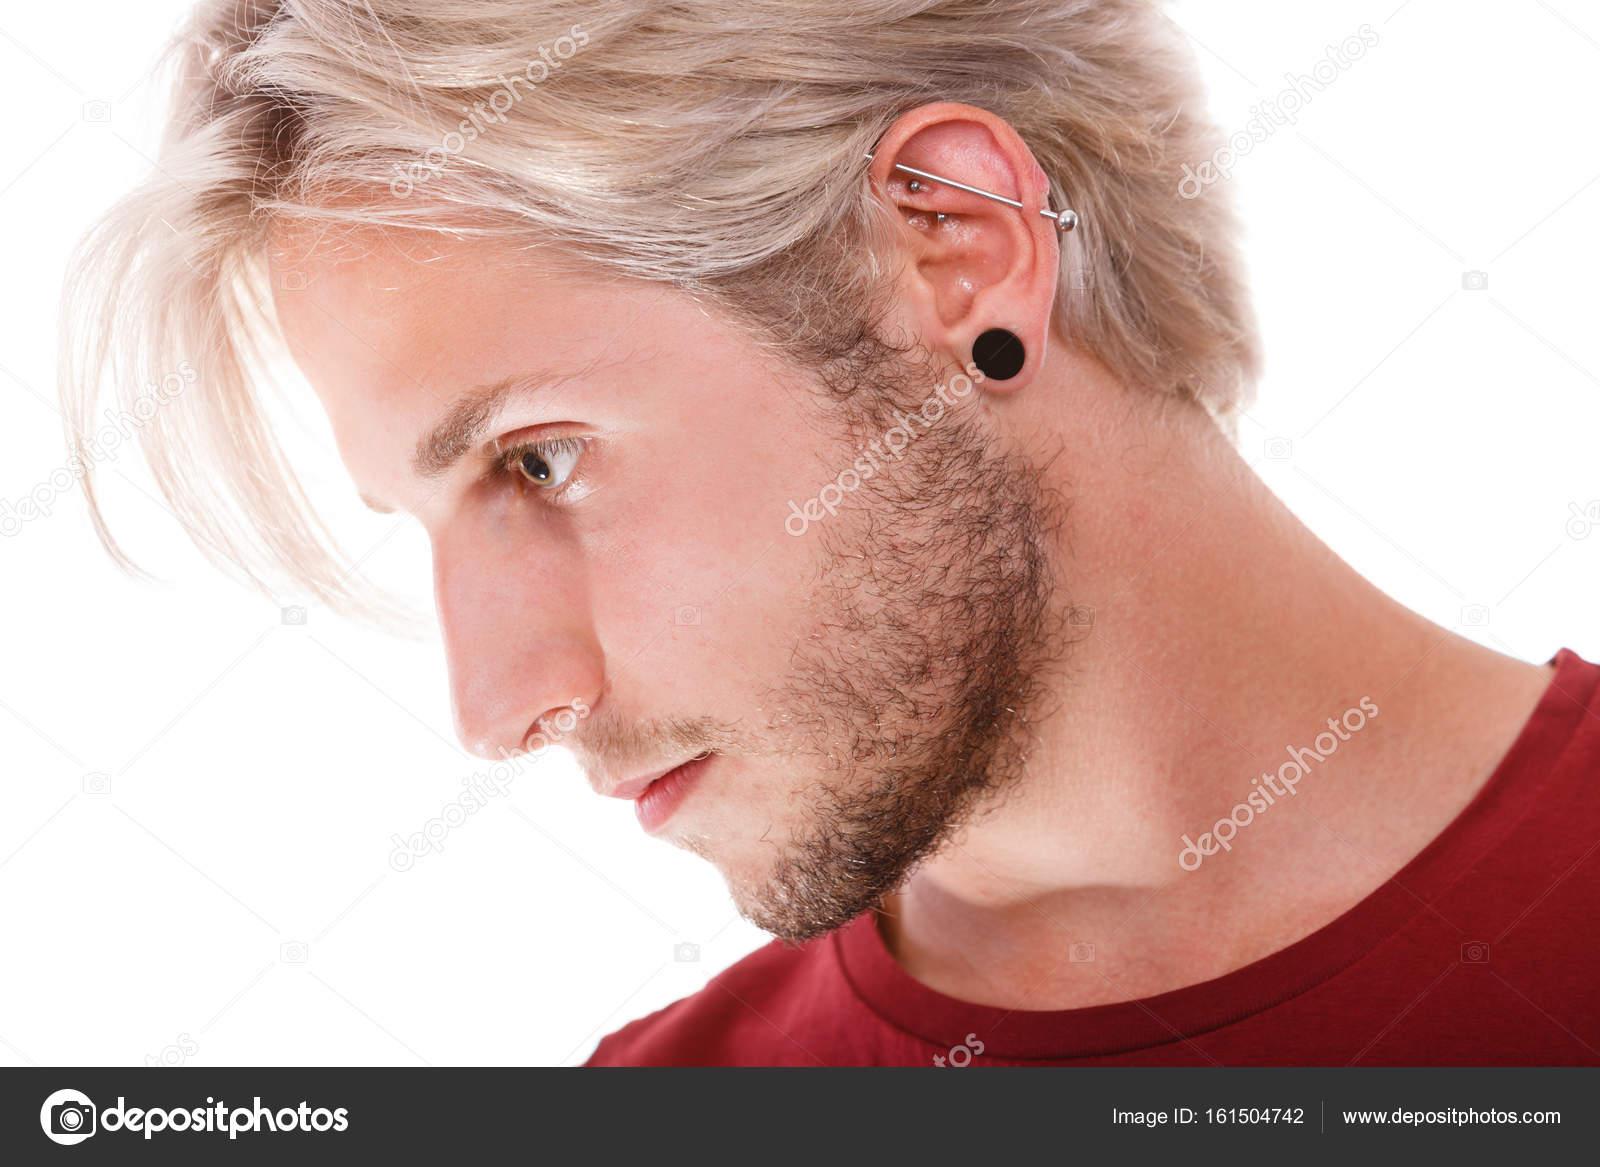 fekete tini frizurák